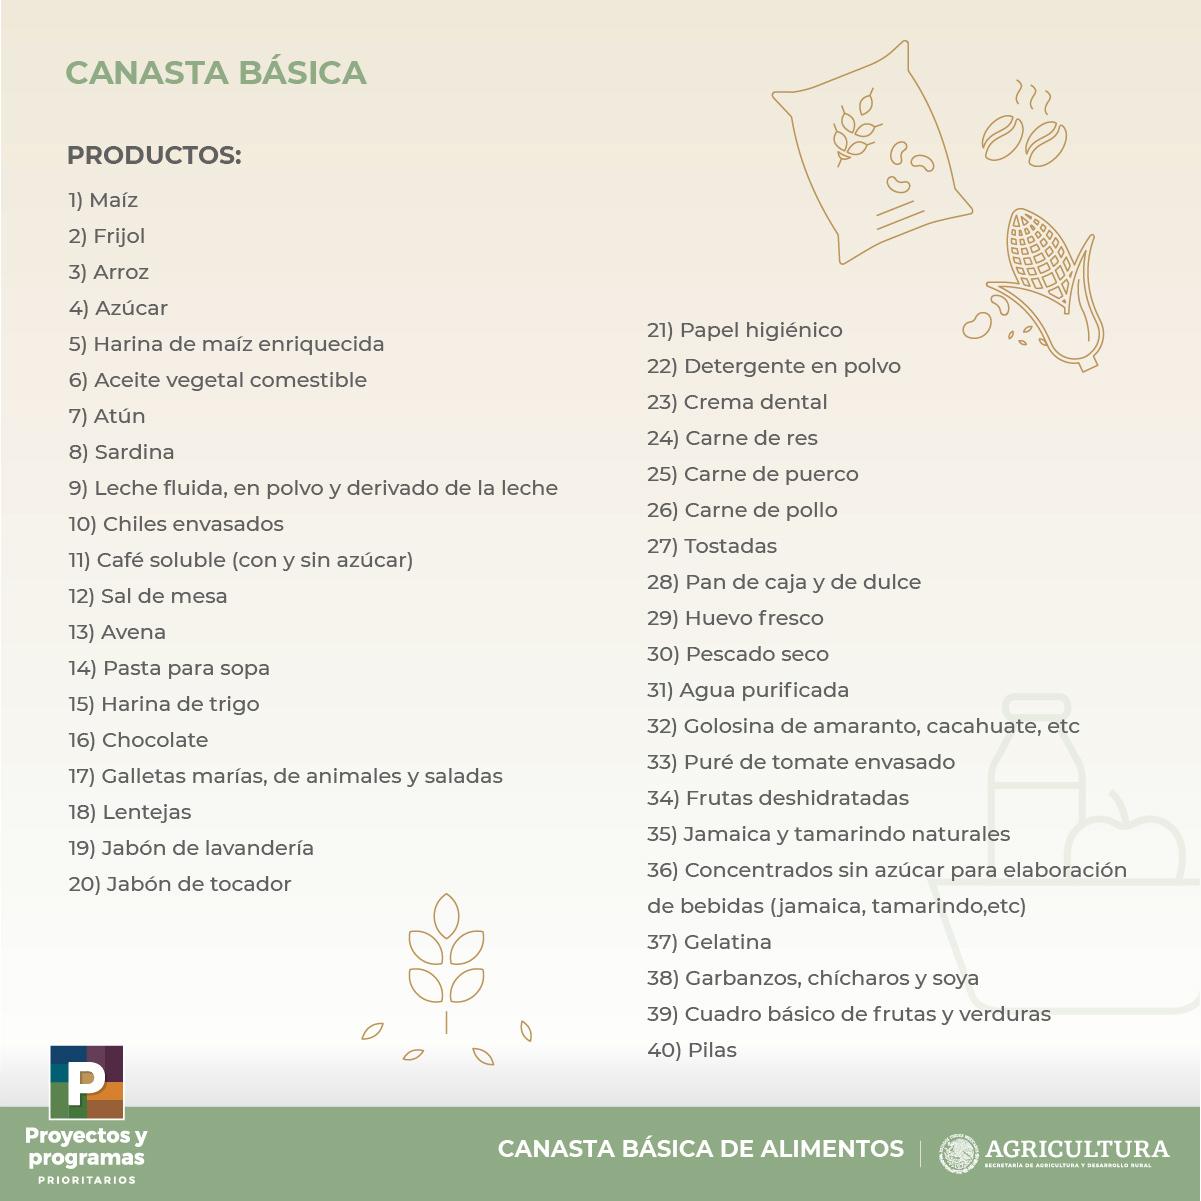 Canasta basica gobierno federal mexicano eleventa